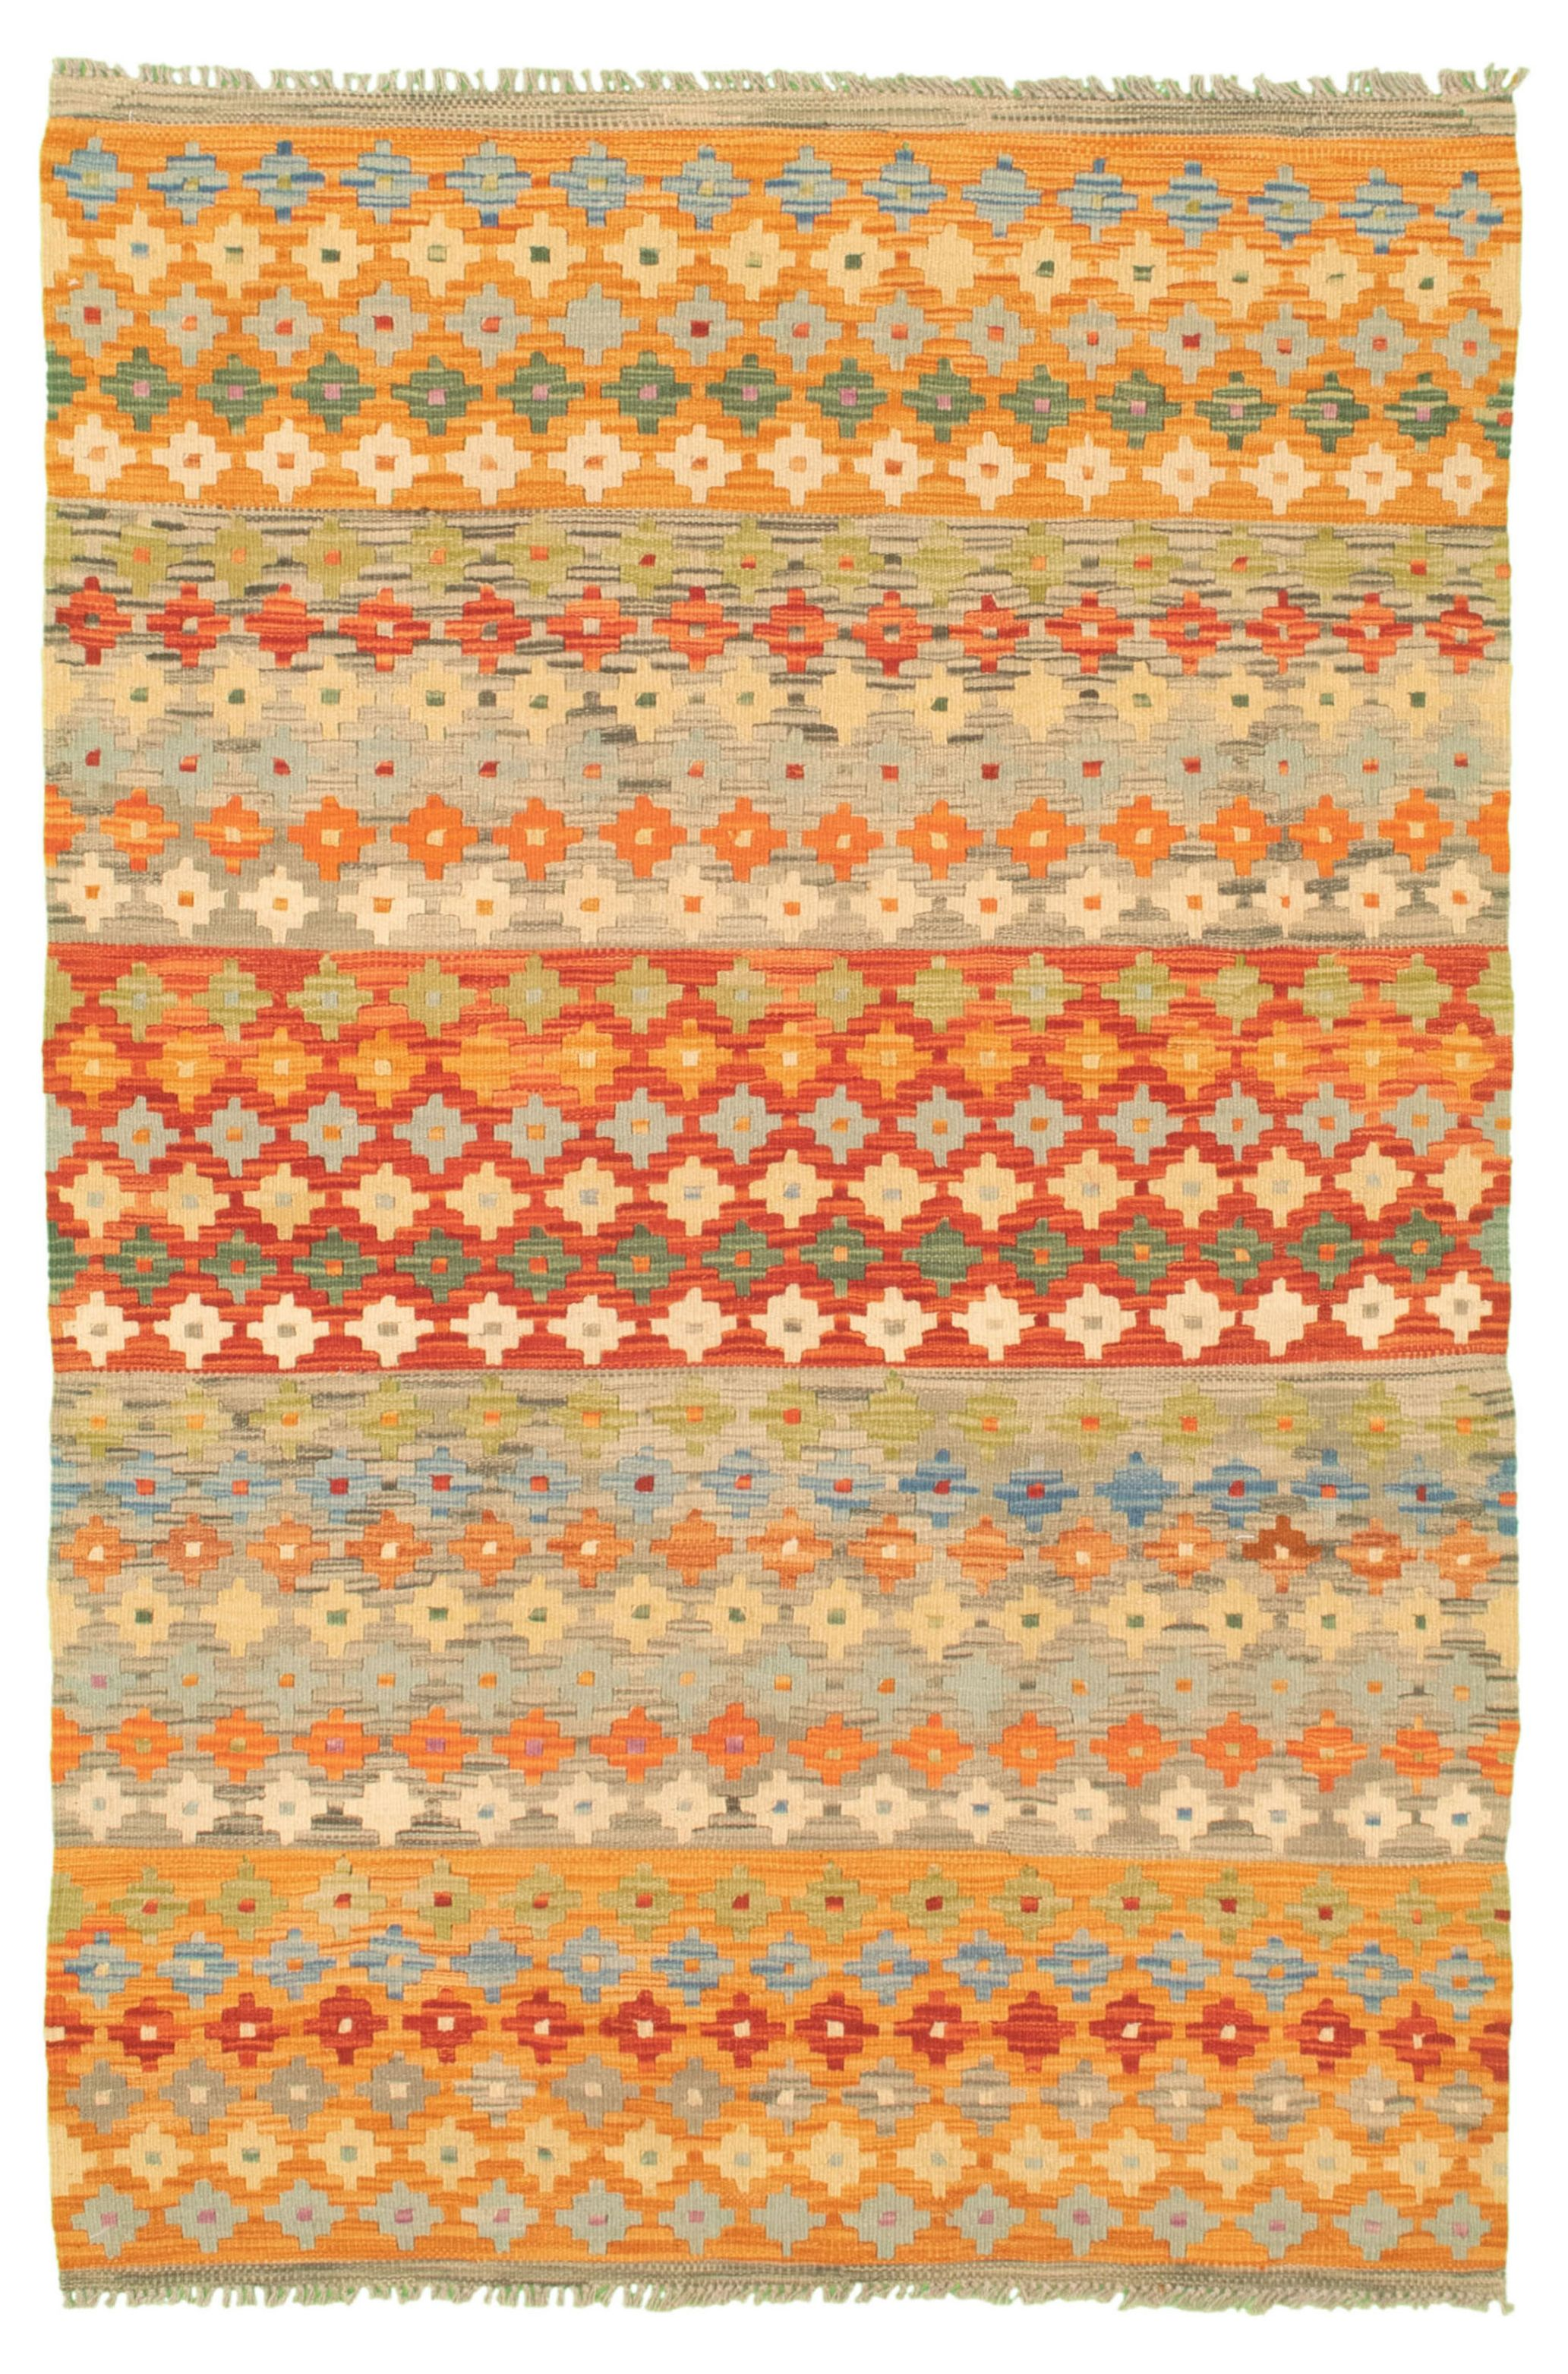 "Hand woven Bold and Colorful  Light Khaki, Orange Wool Kilim 4'2"" x 6'3"" Size: 4'2"" x 6'3"""